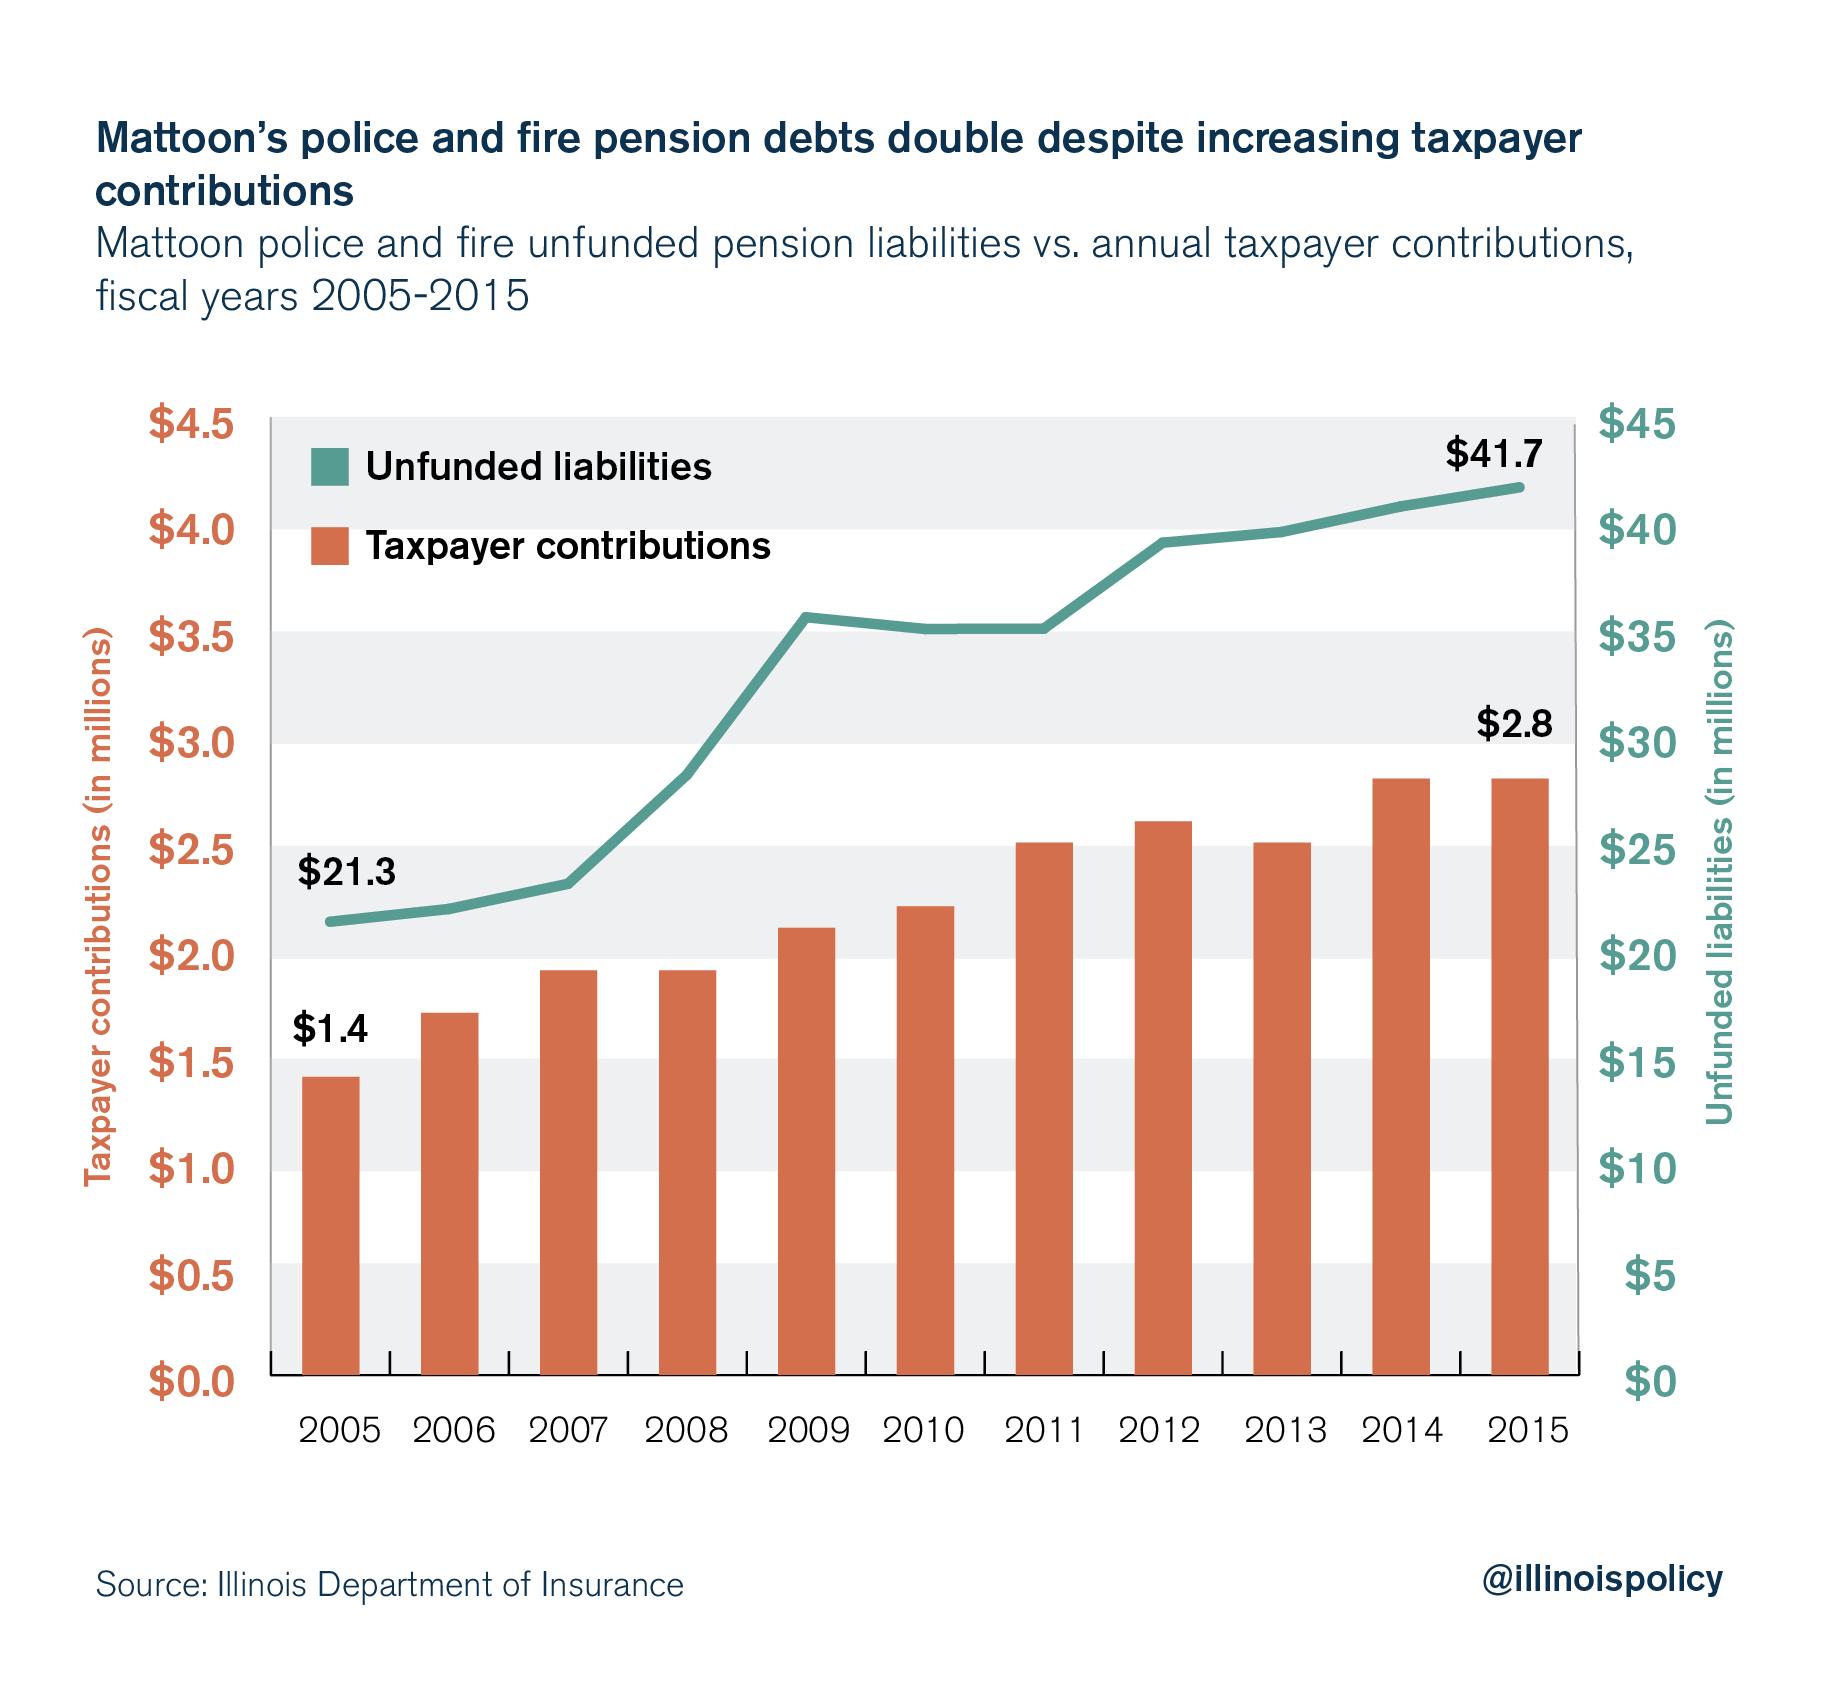 Mattoon pensions